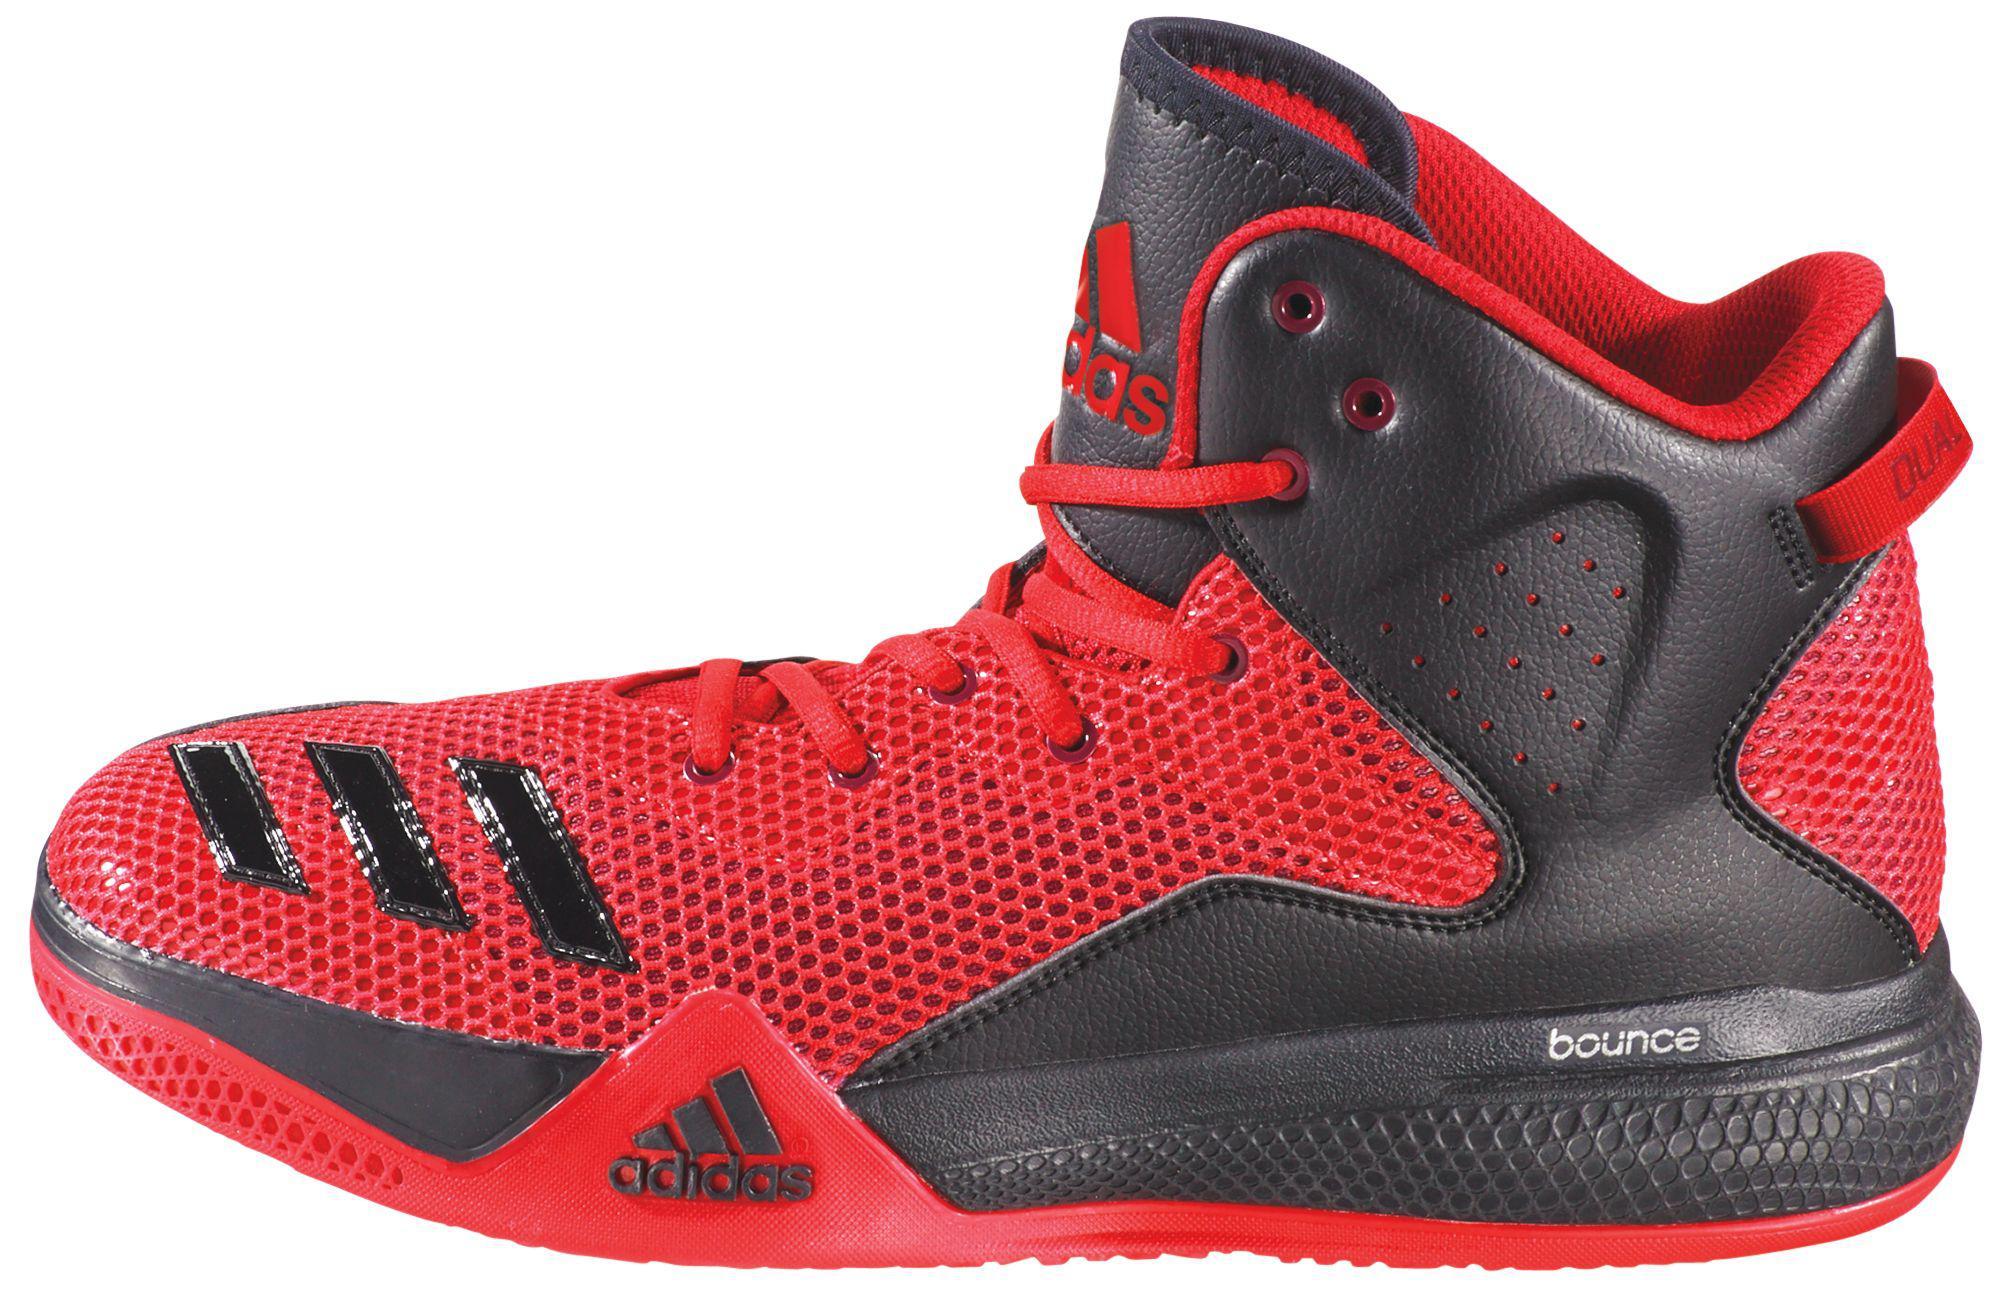 adidas dual threat basketball shoes Buy